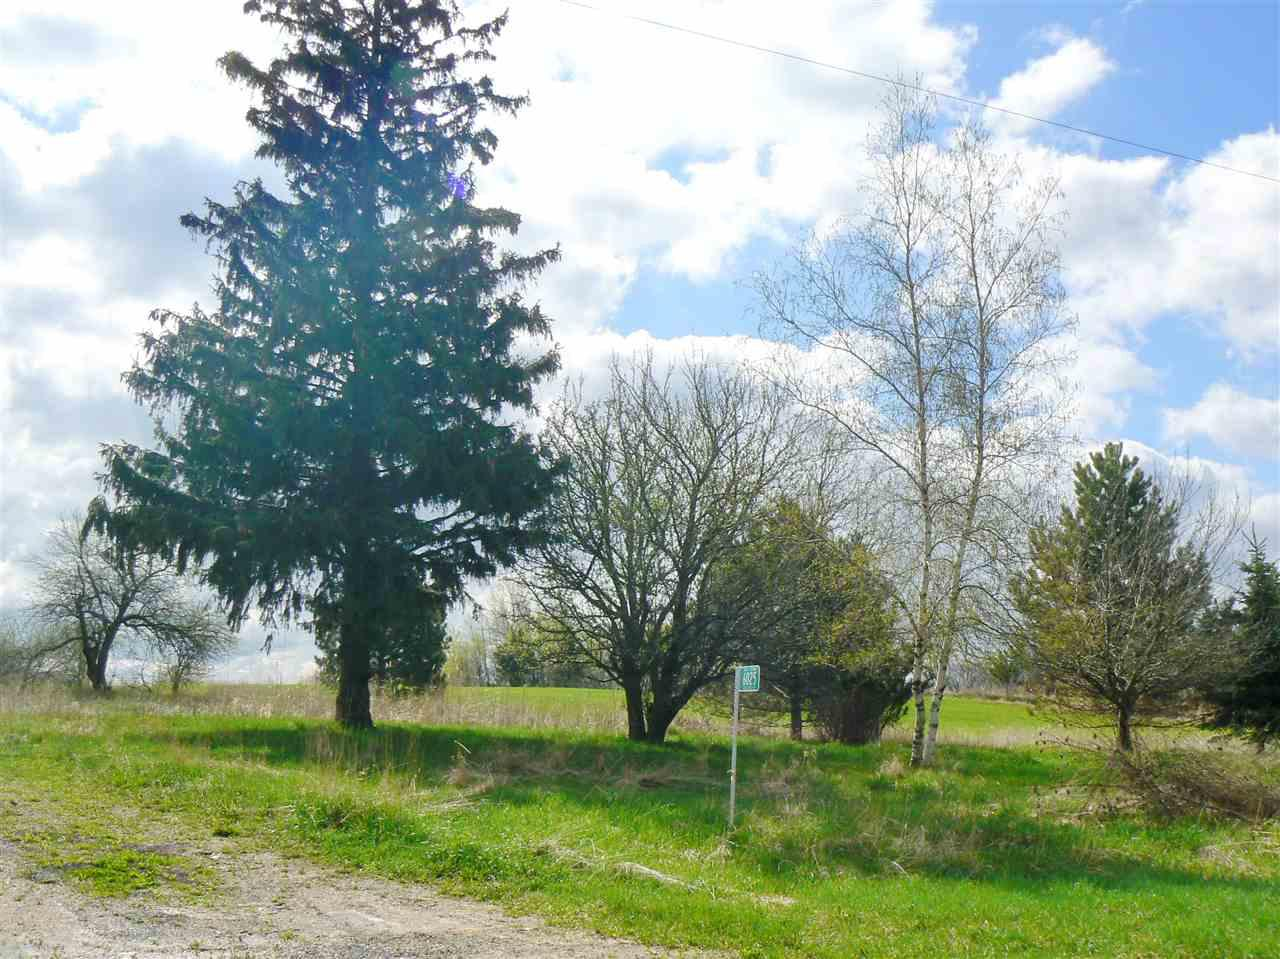 View Vacant Land For Sale at 6025 LEDGE CREST ROAD, De Pere, WI